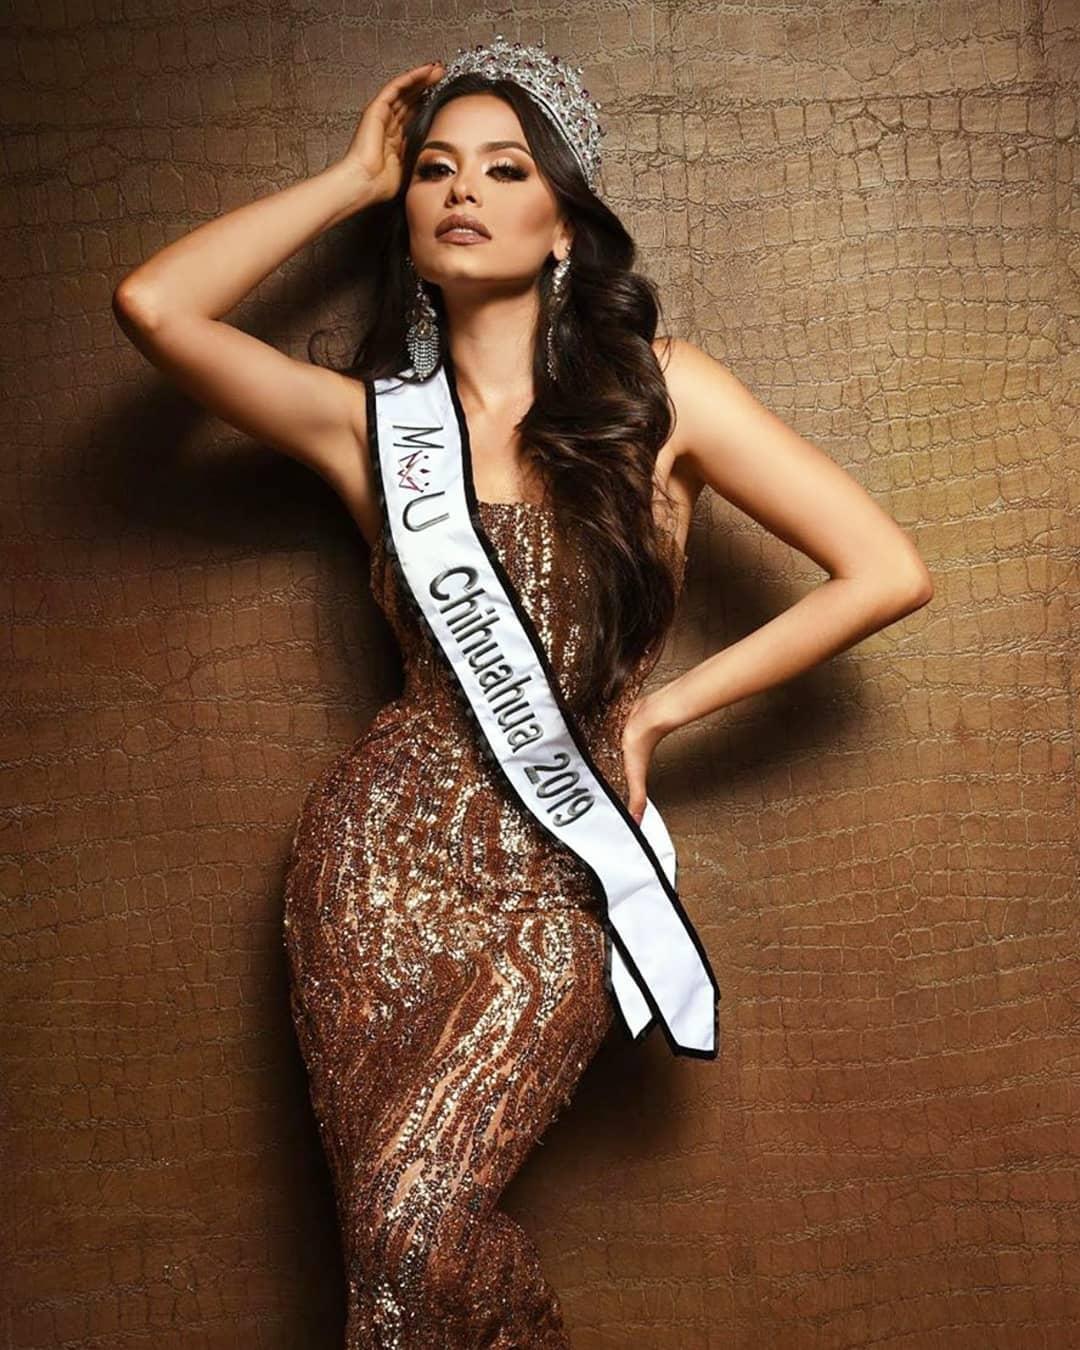 andrea meza, mexicana universal chihuahua 2020/1st runner-up de miss world 2017. - Página 41 81340310